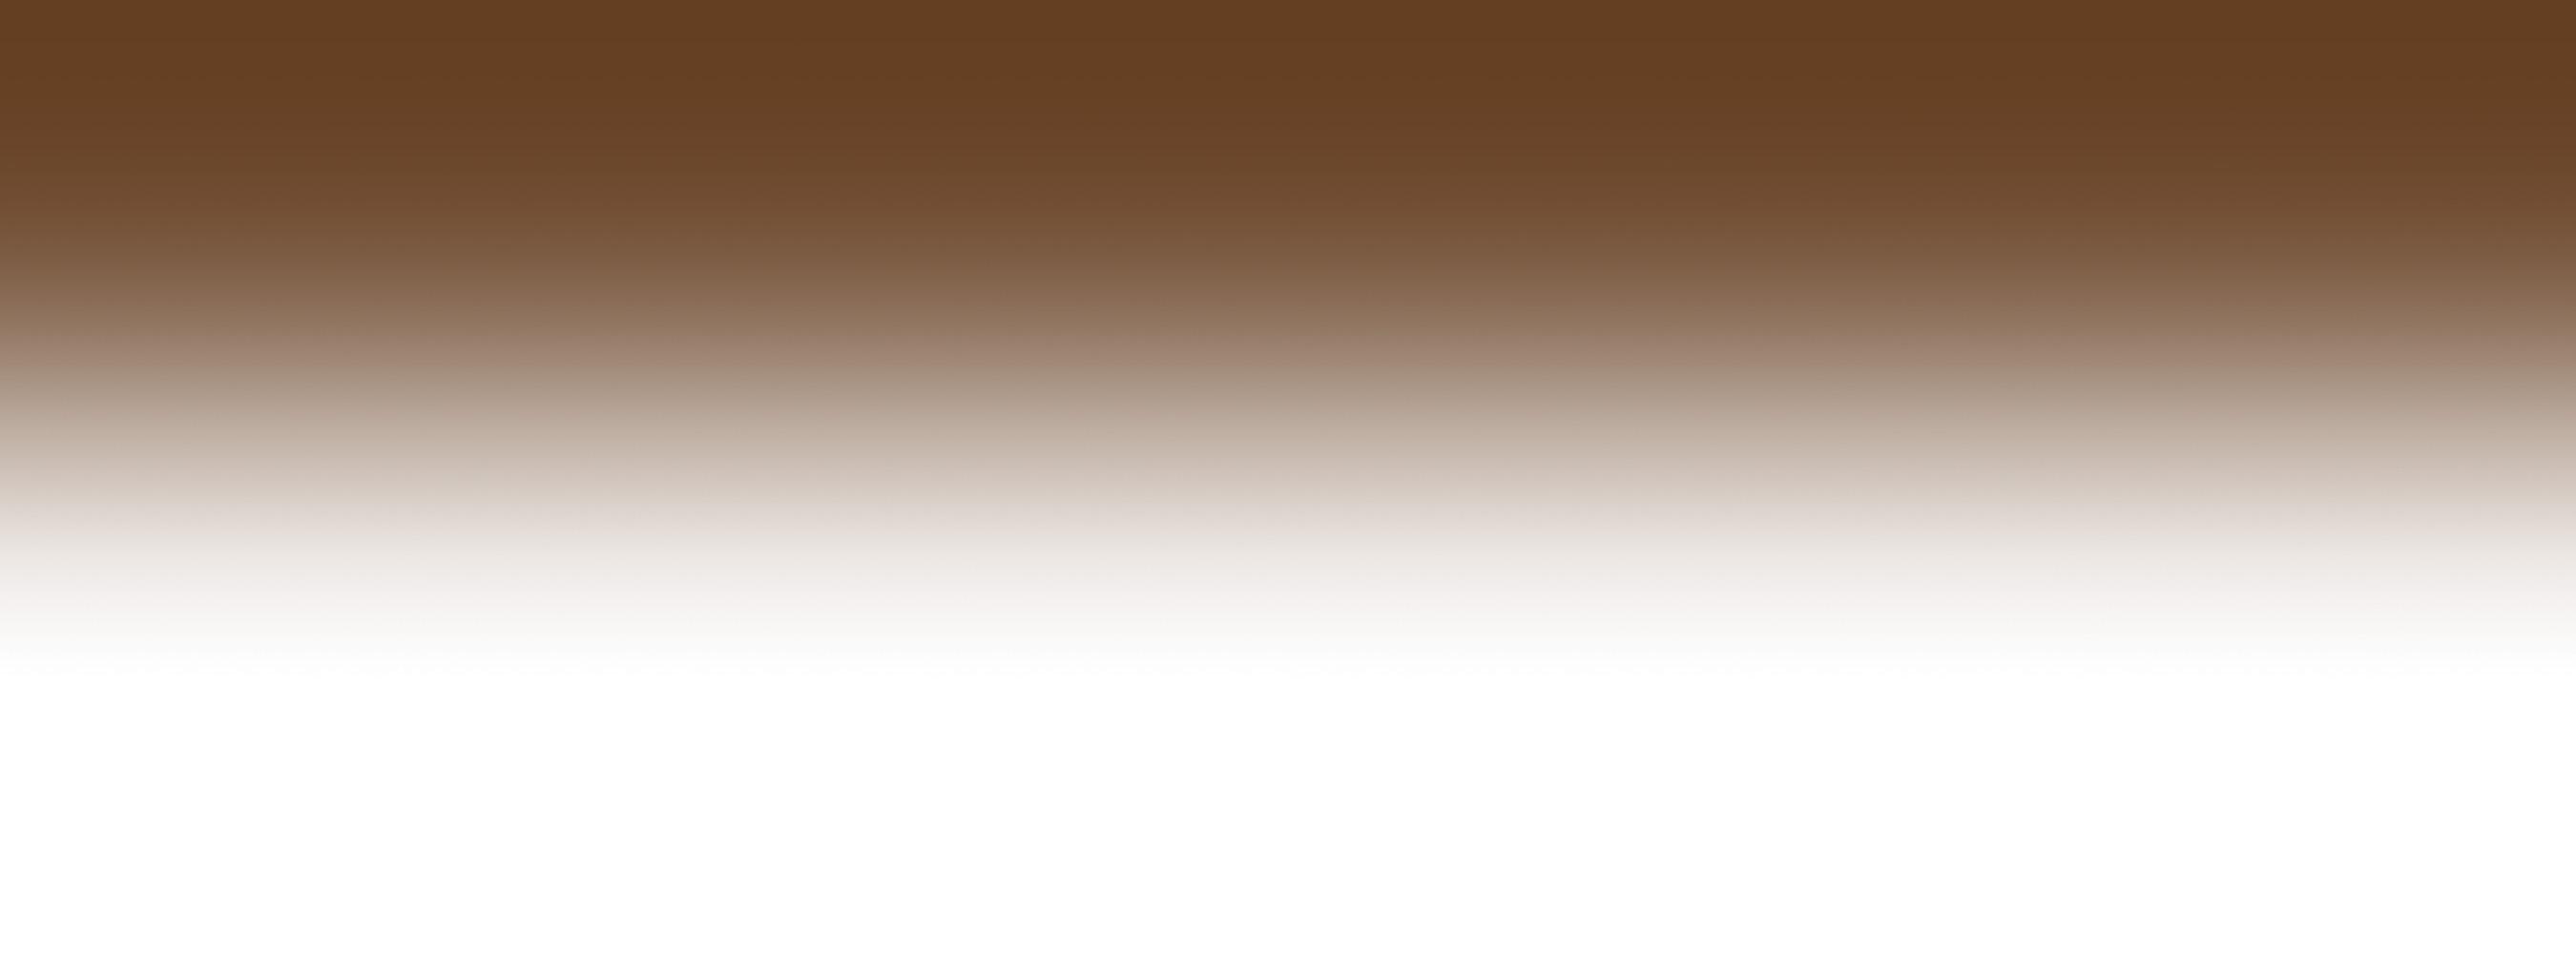 fond_2700x1000_layerslider_bockel_nutalsace_chocolat_noisette_alsace_france_pate_tartiner